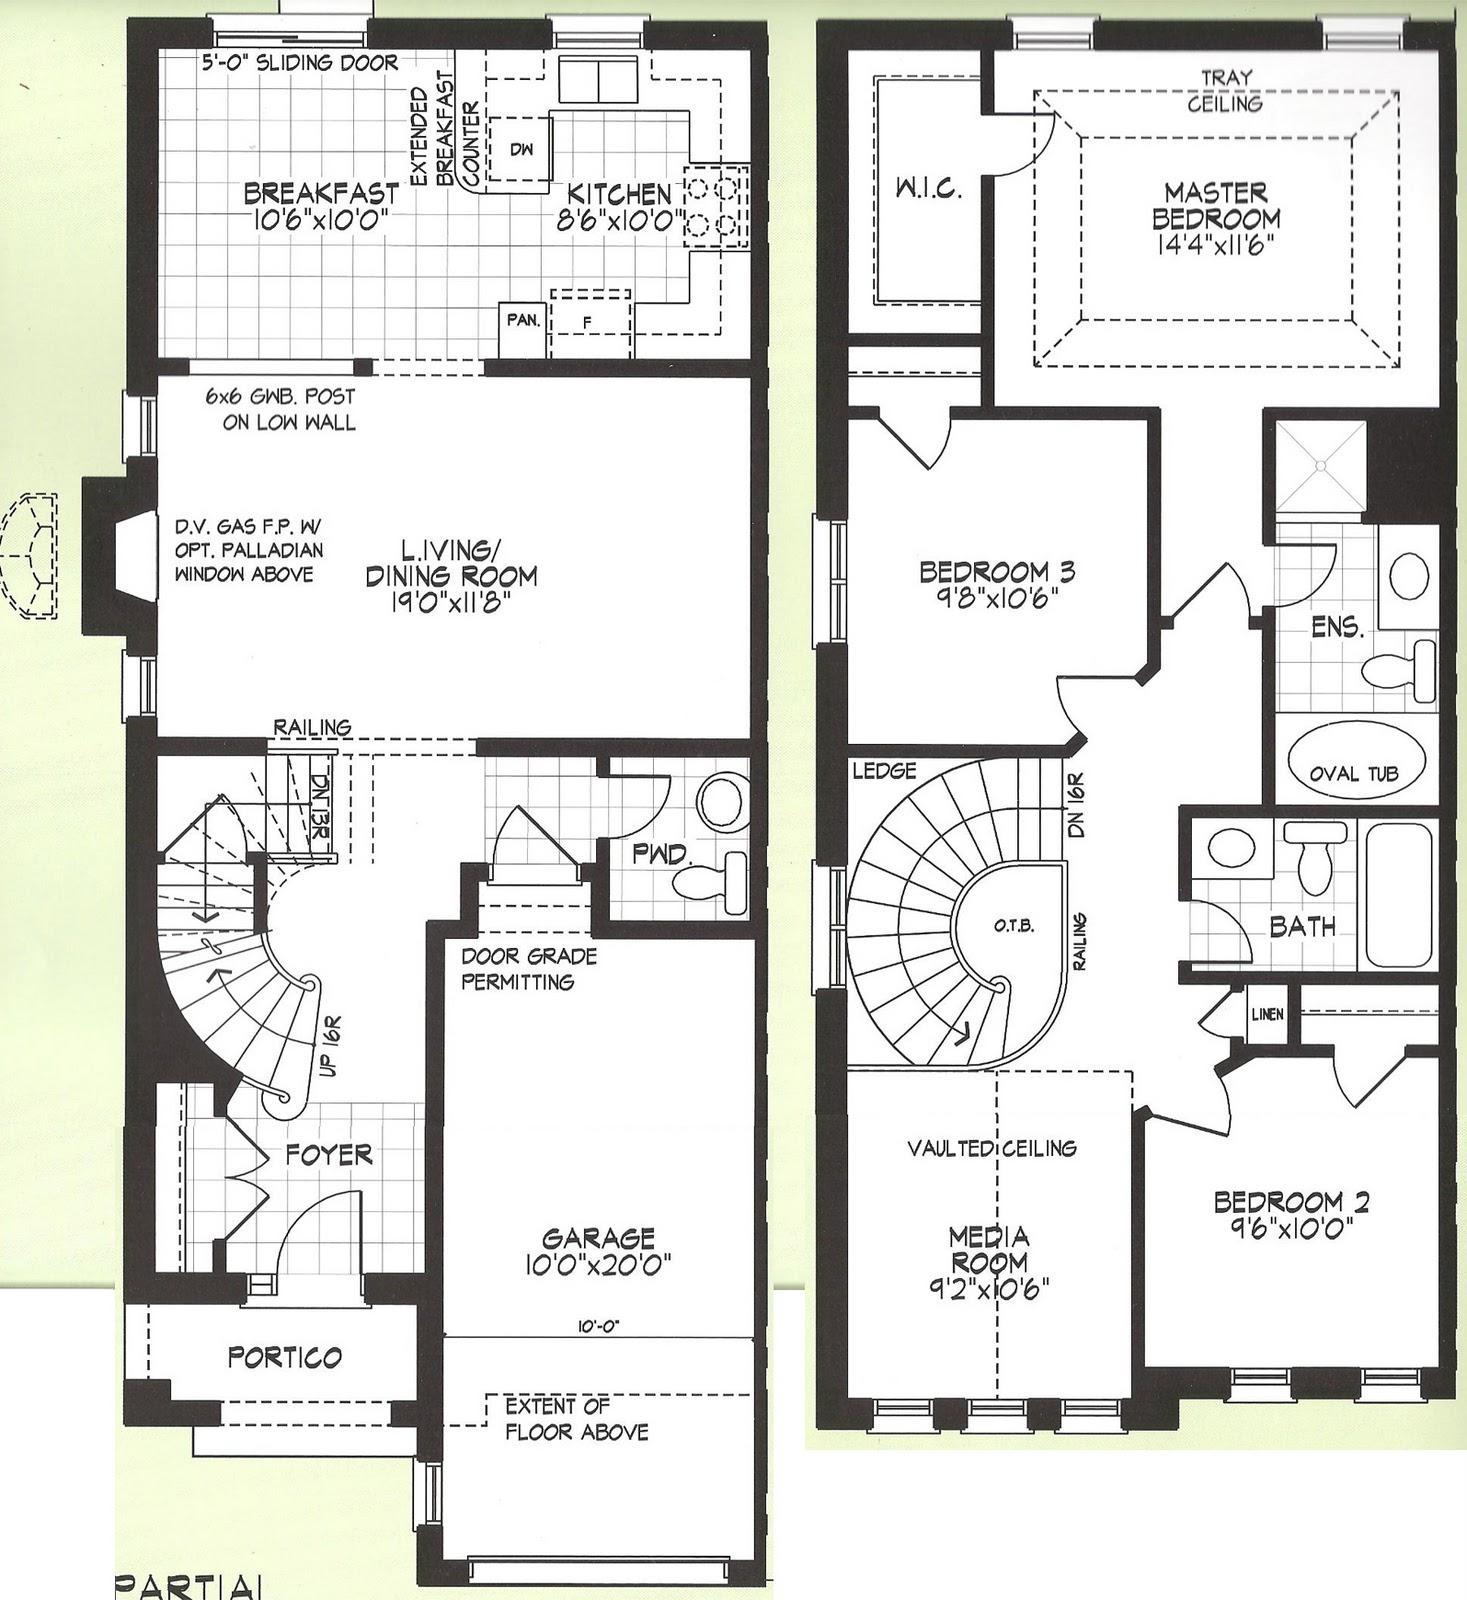 Amazing images of mercedes homes kayla floor plan fiat for Mercedes homes floor plans